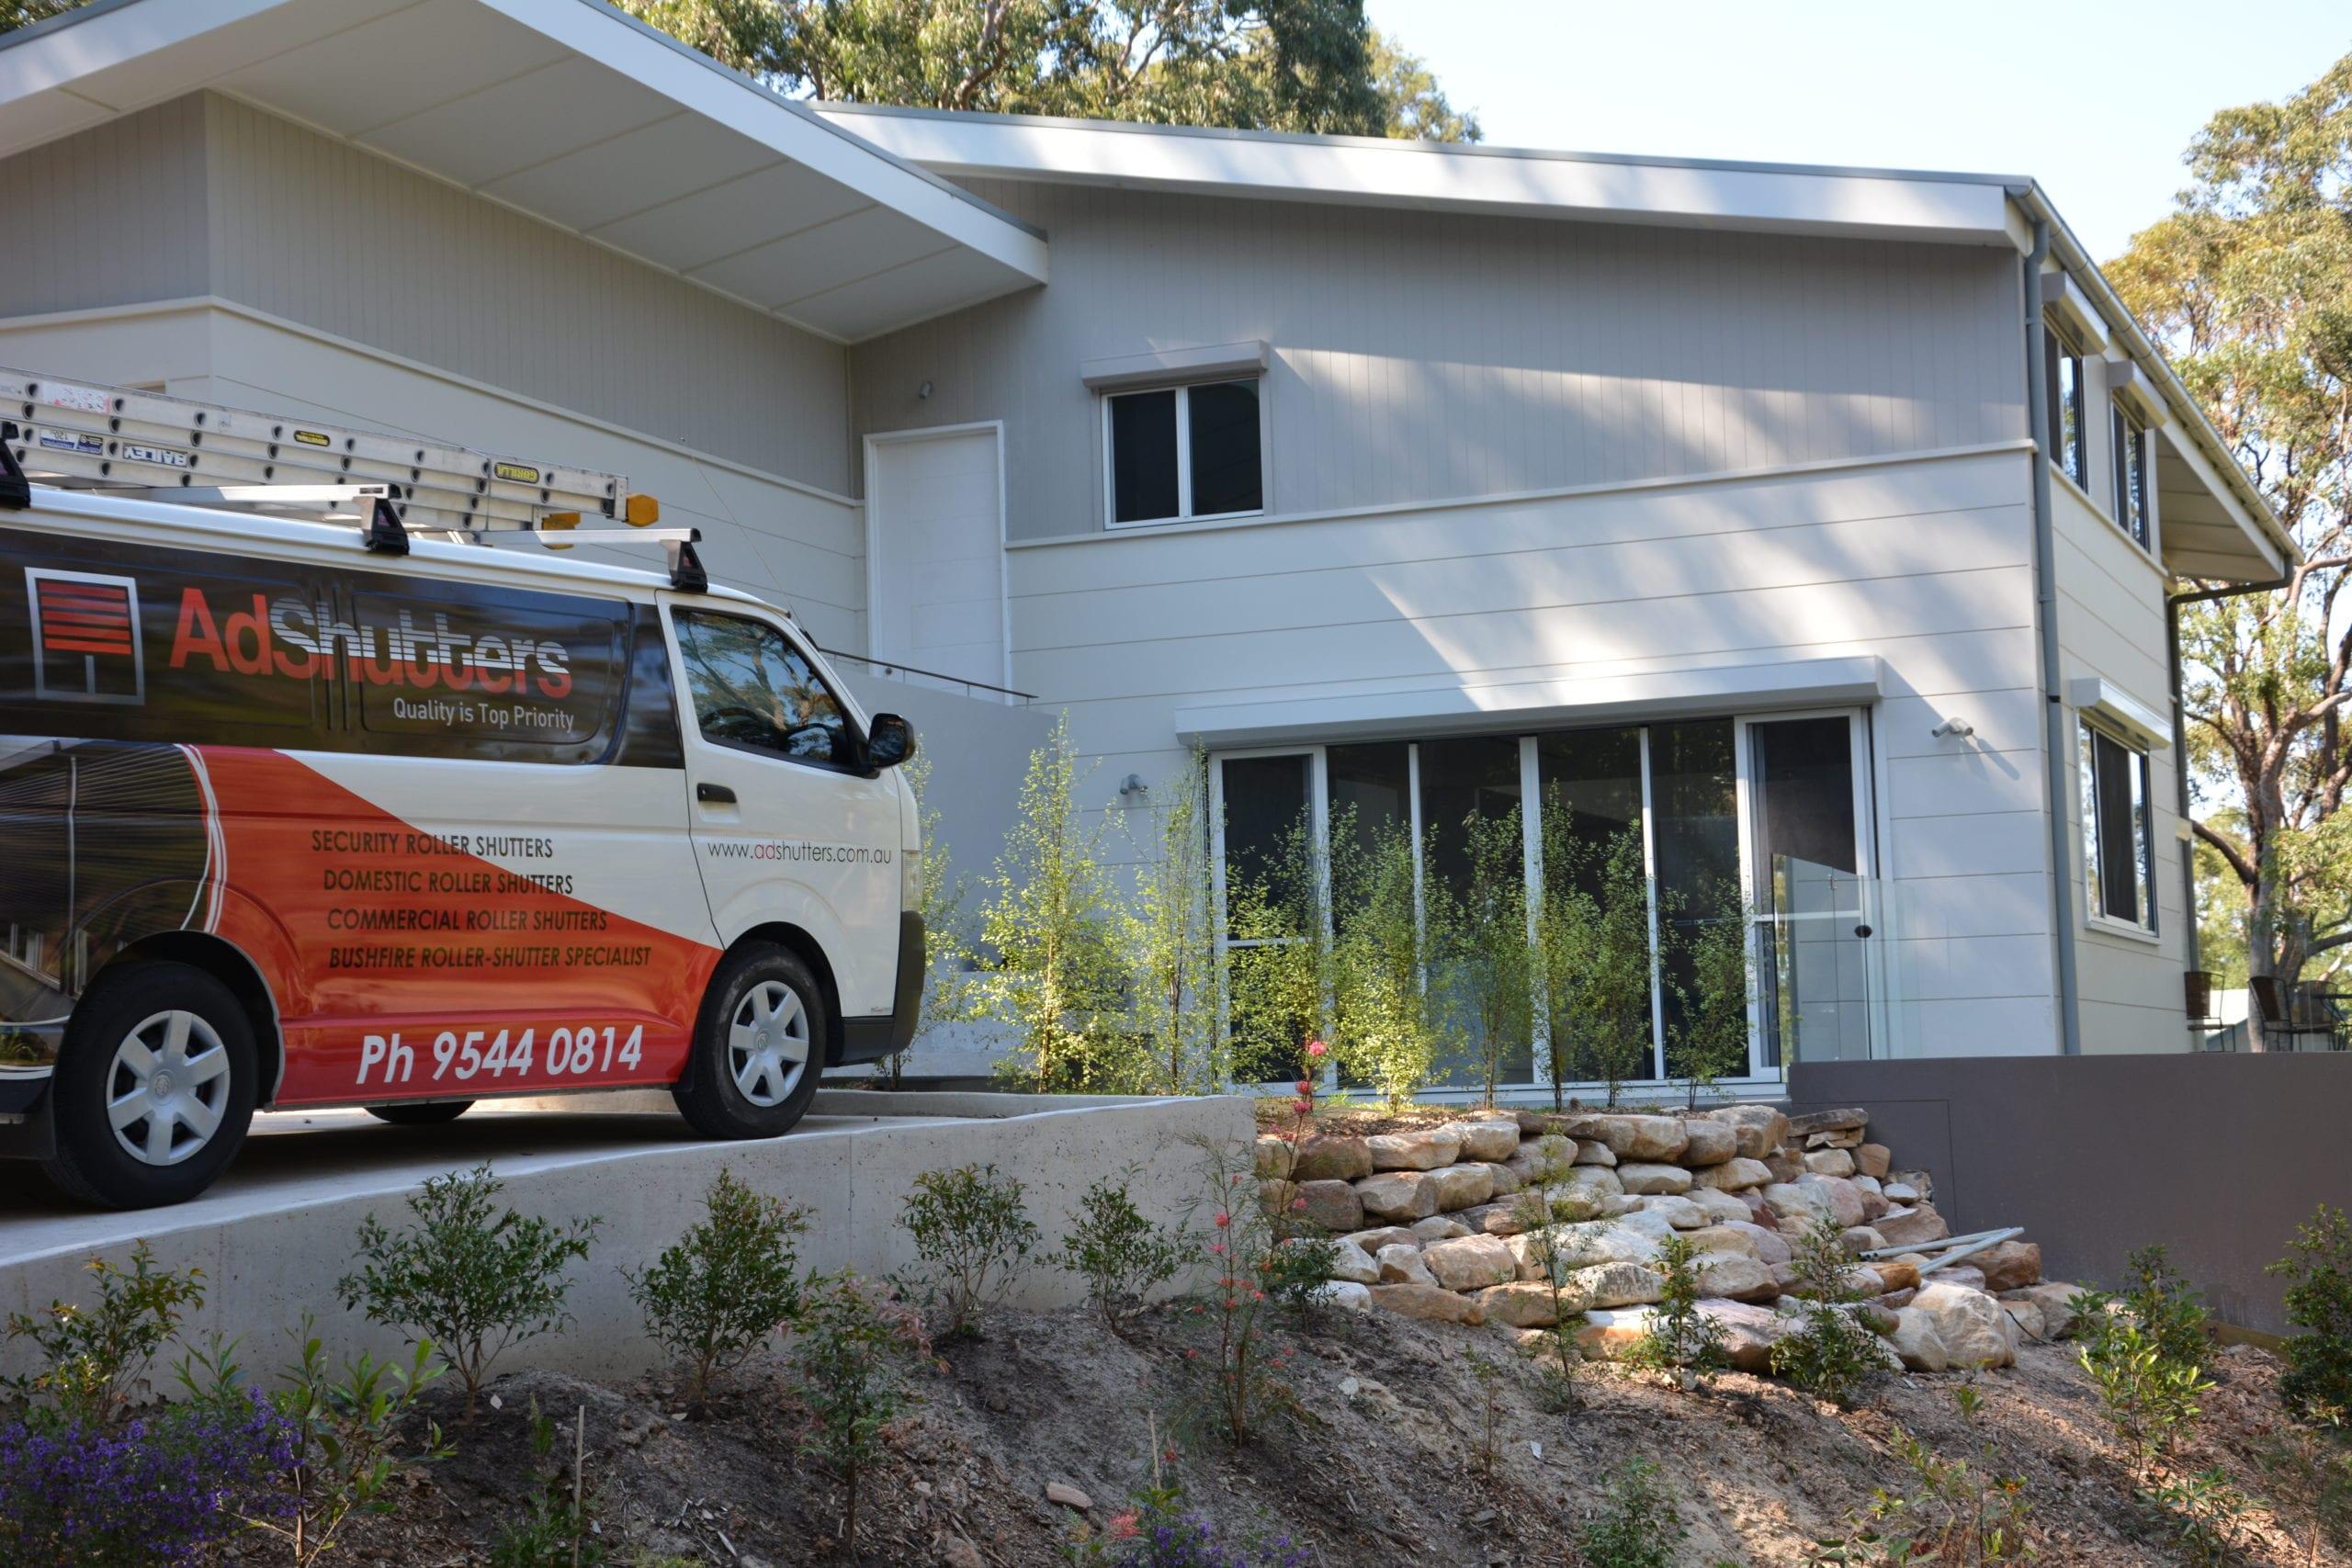 bushfire shutters sydney gold coast